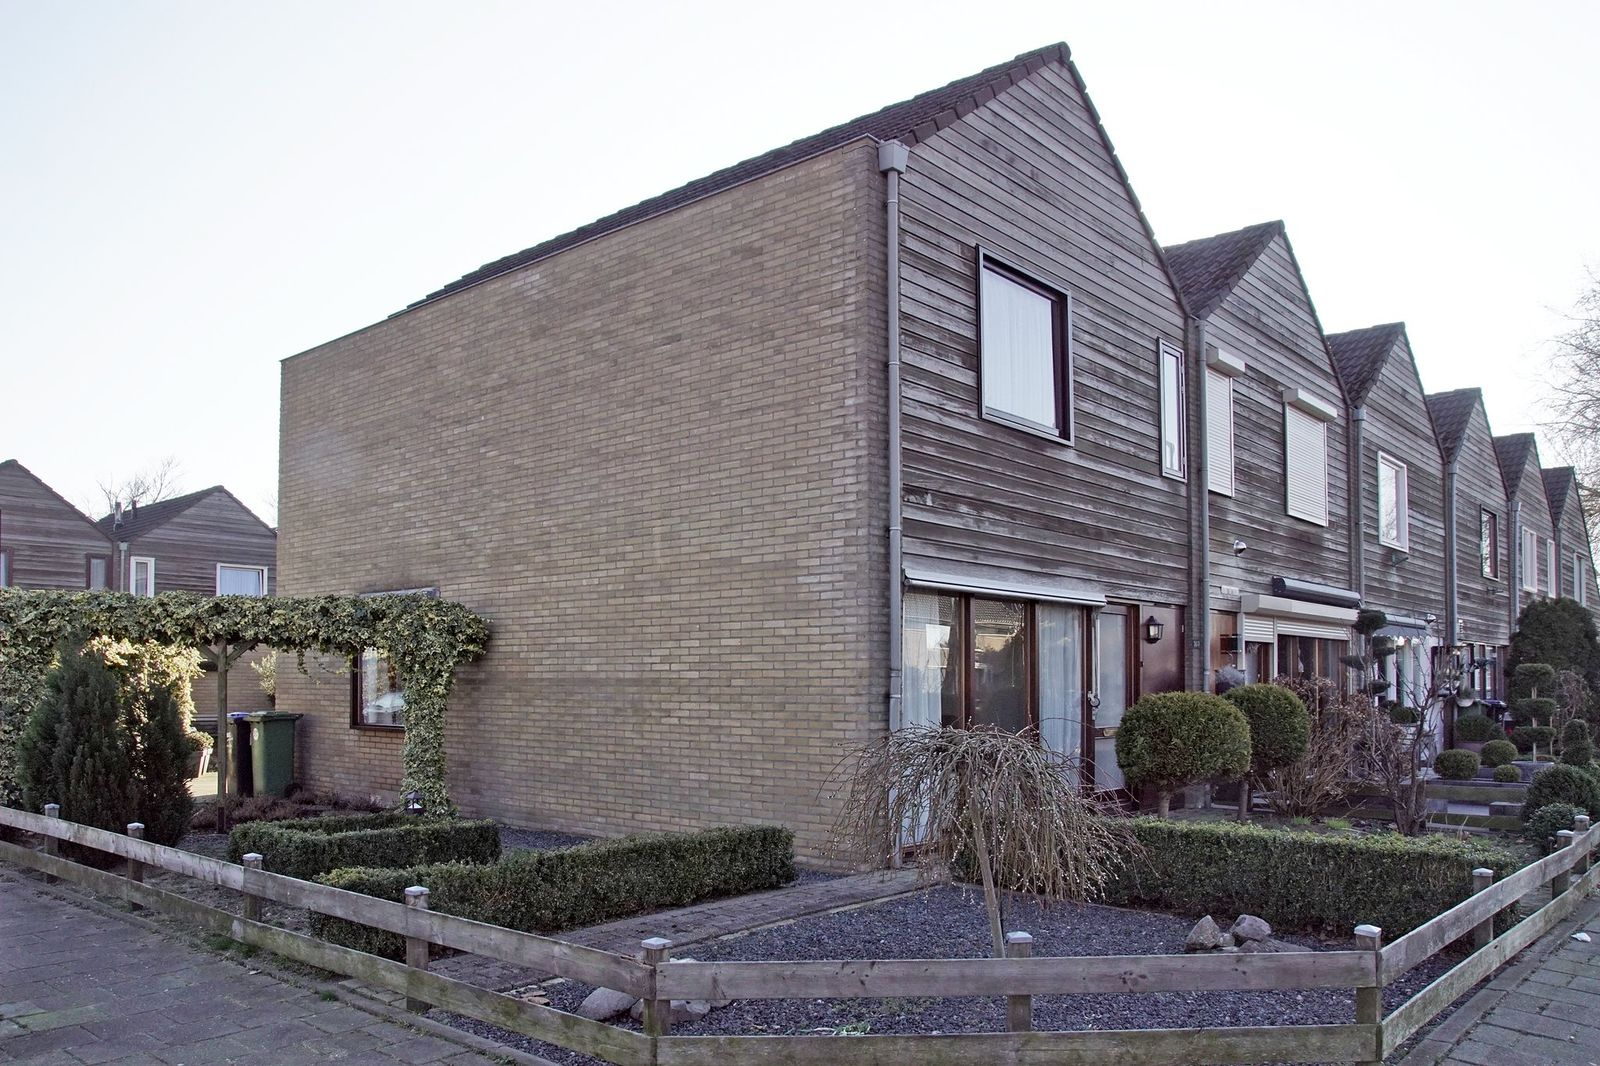 Lankforst 1425, Nijmegen